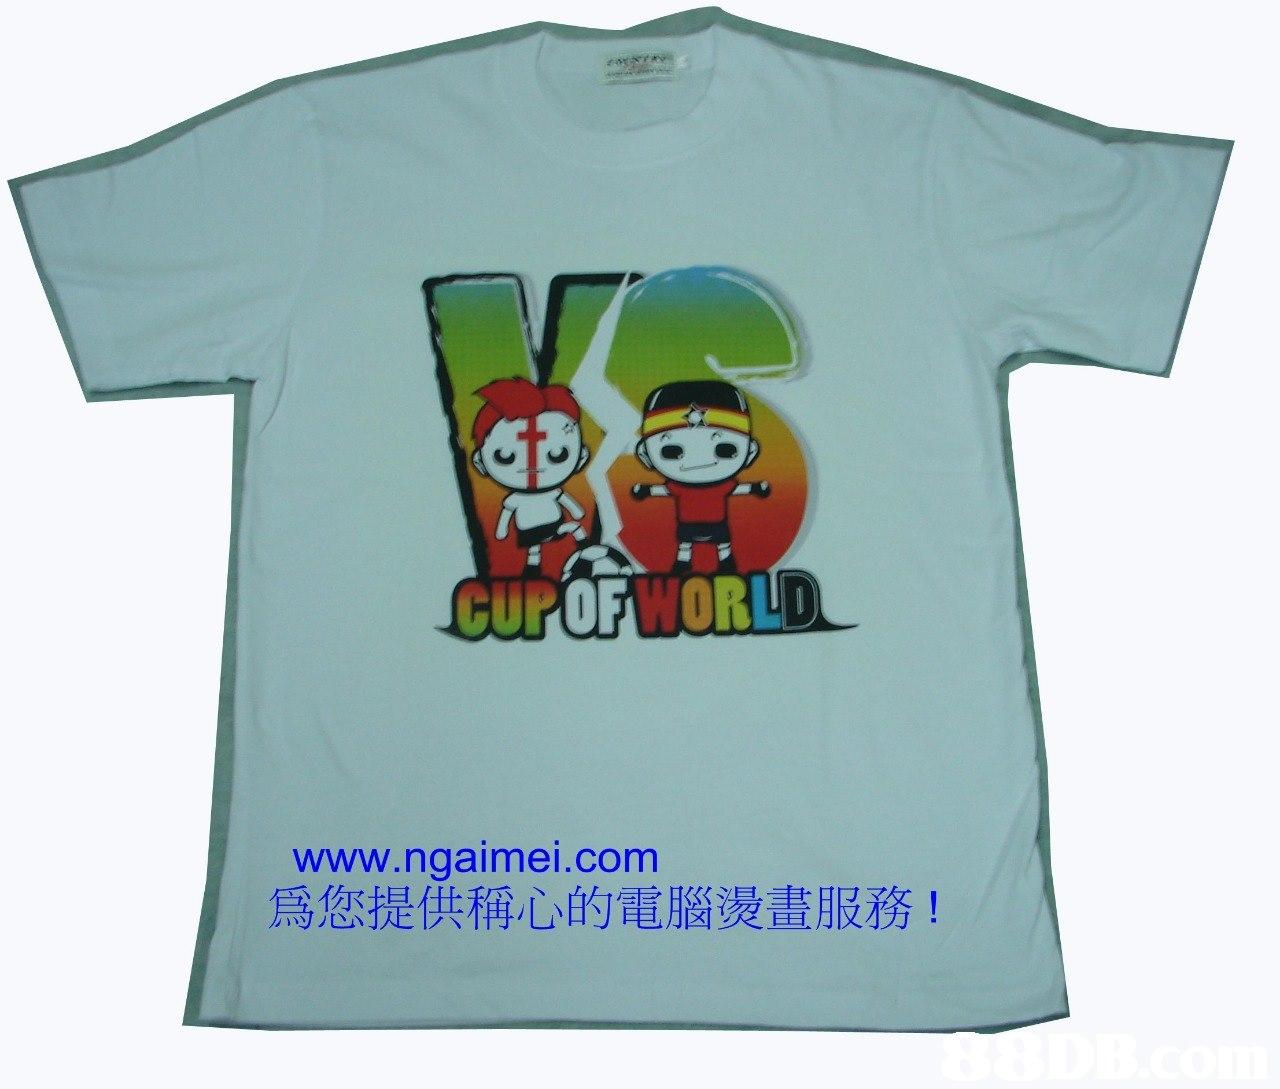 CUPOFWORL www.ngaimei.com 爲您提供稱心的電腦燙畫服務!  t shirt,clothing,sleeve,yellow,text